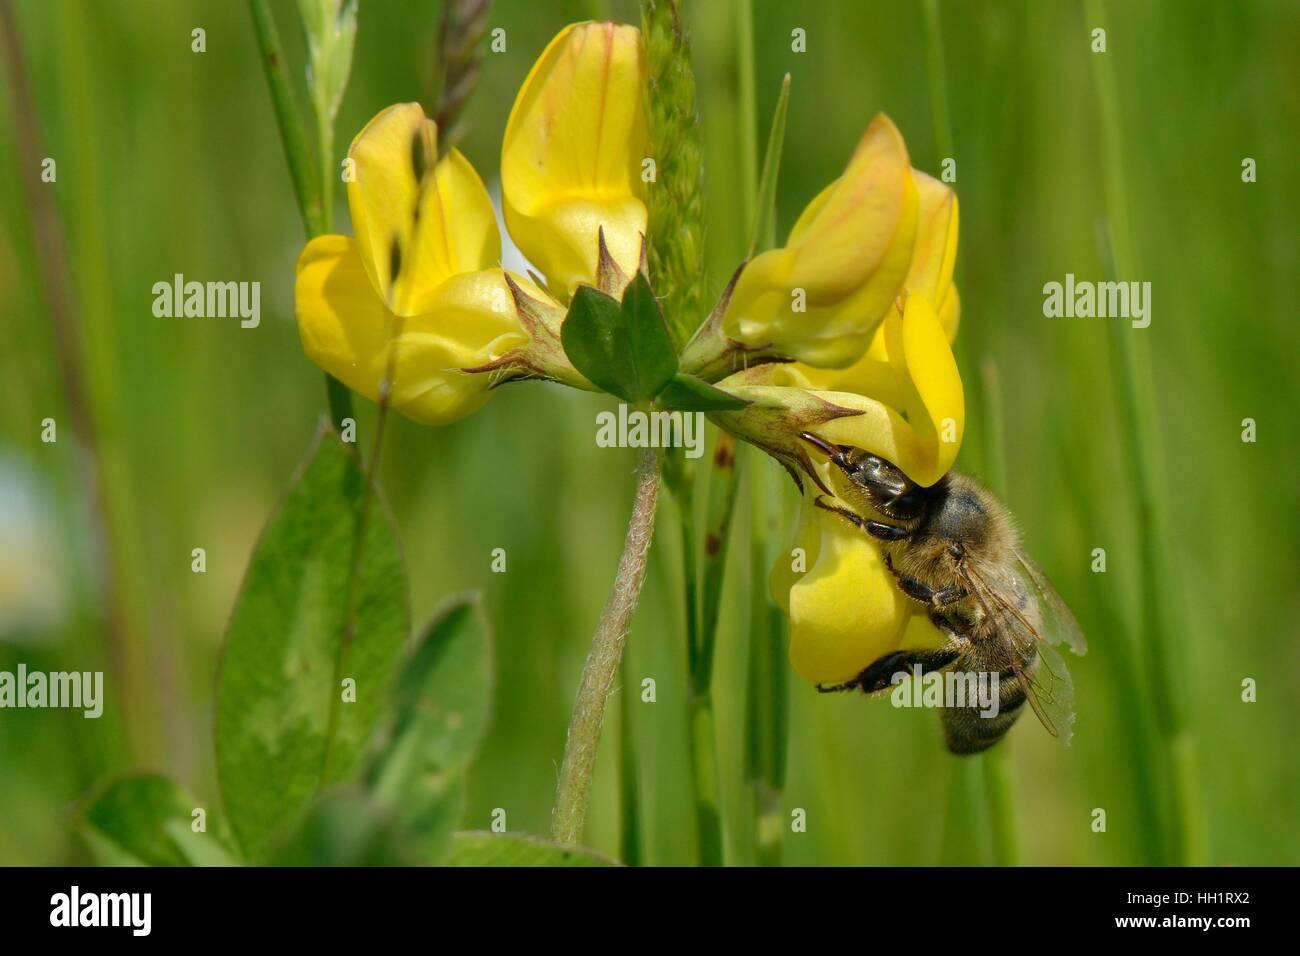 Honey bee (Apis mellifera) nectaring on Birdsfoot trefoil flower (Lotus corniculatus), RSPB Dungeness Nature Reserve, - Stock Image